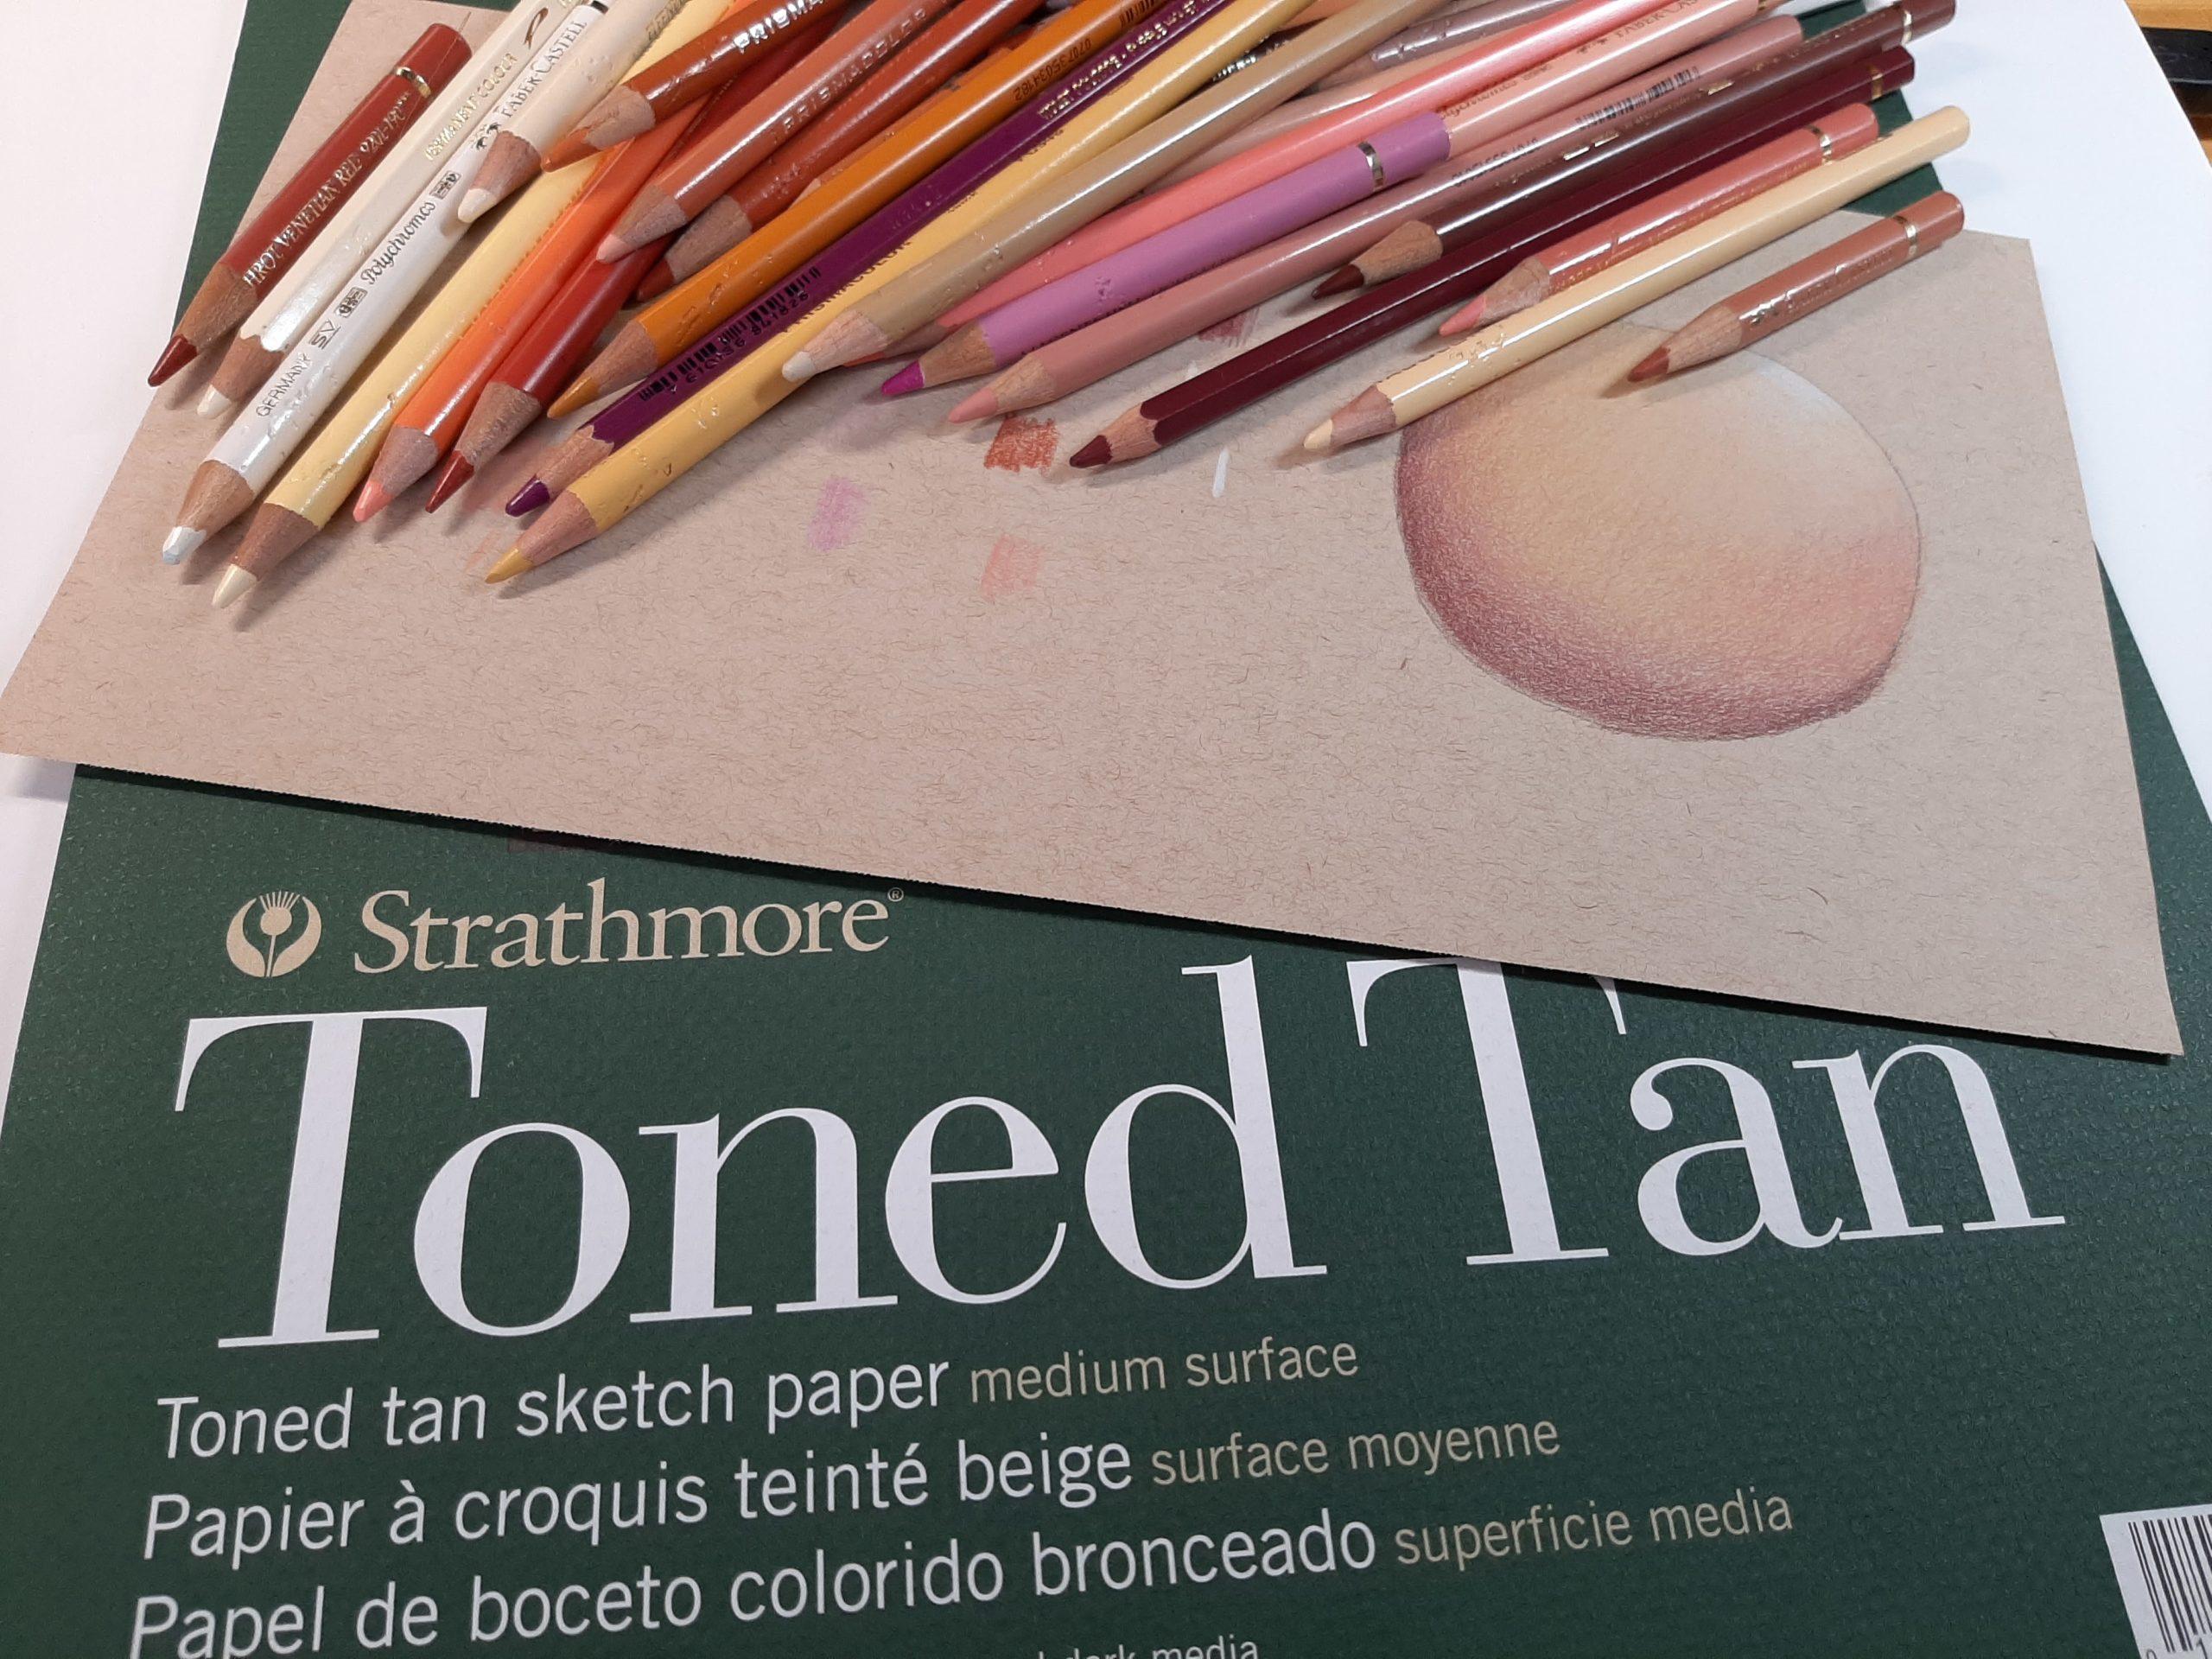 Hautfarben Typ: hell für das Strathmore Toned Tan Papier